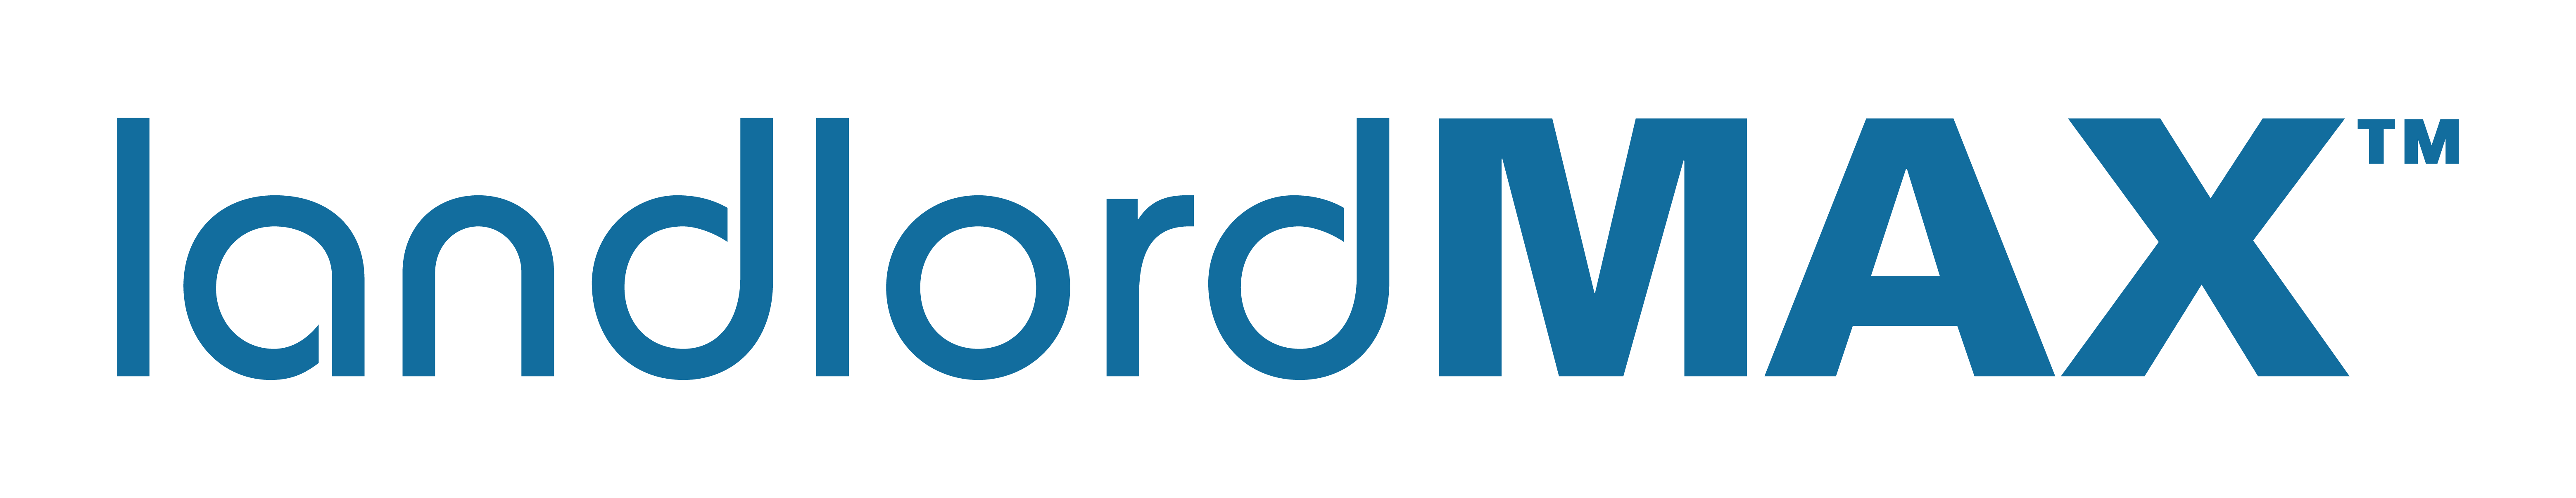 landlordmax-logo